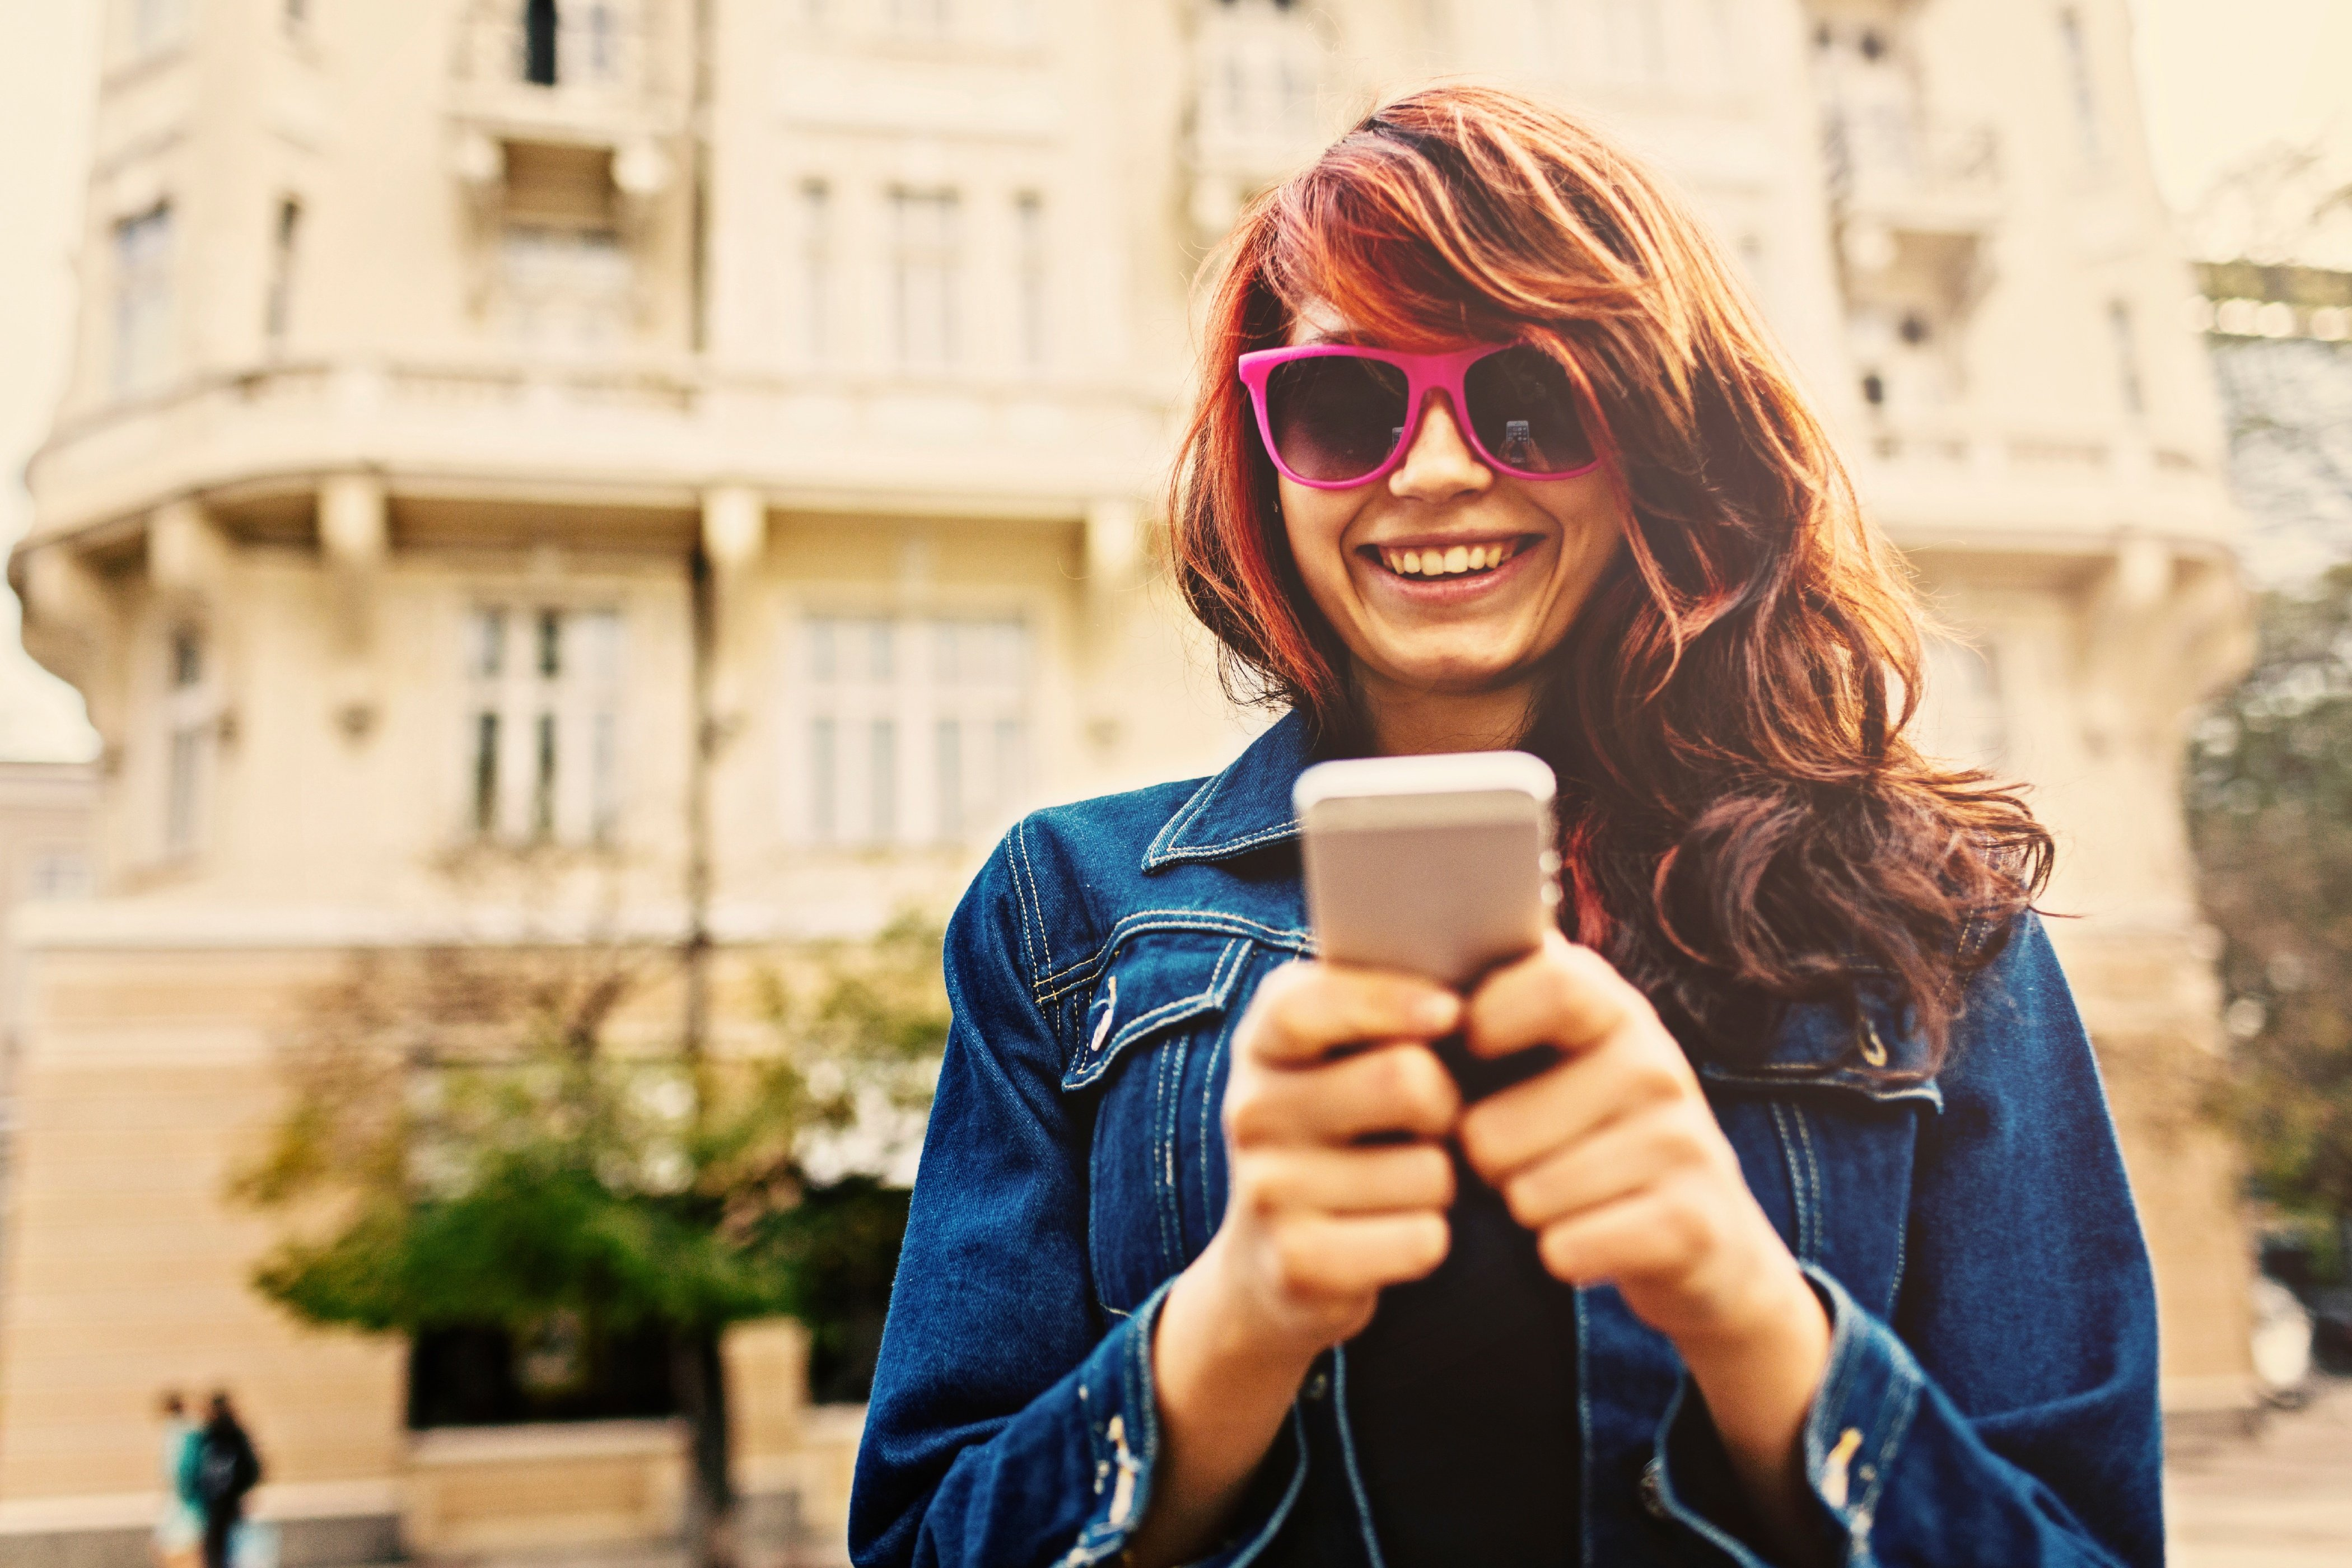 Girl_and_phone.jpg